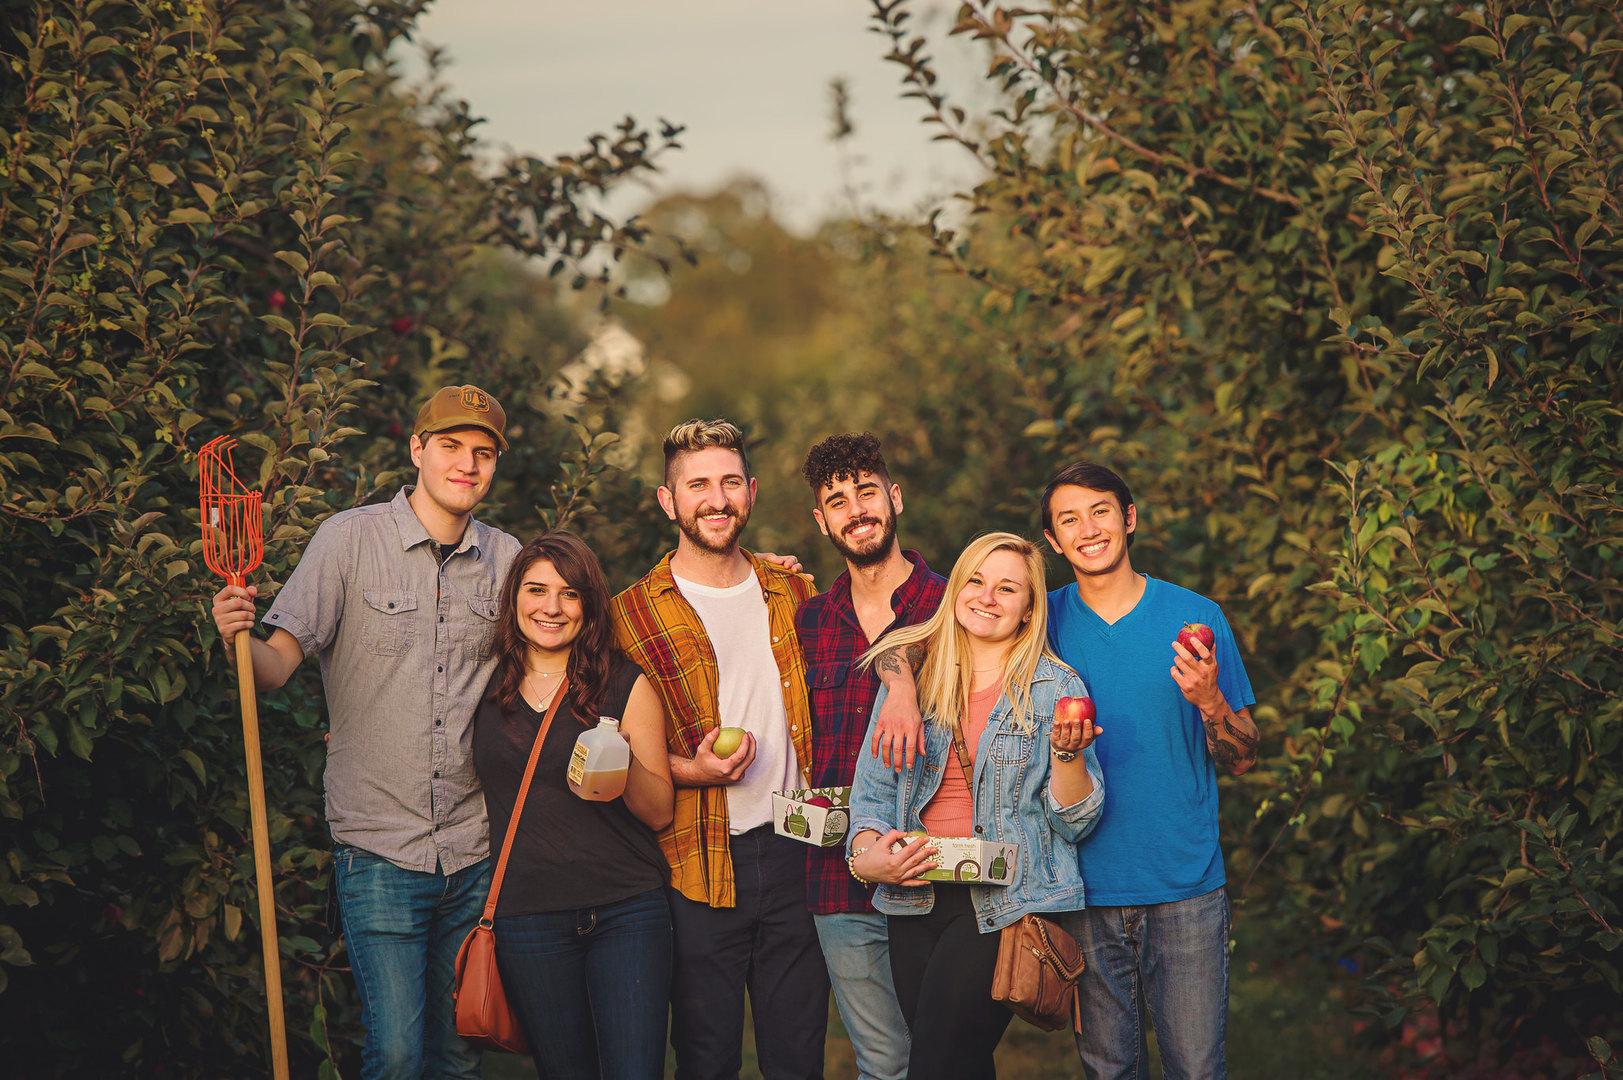 Apple Festival at Linvilla Orchards